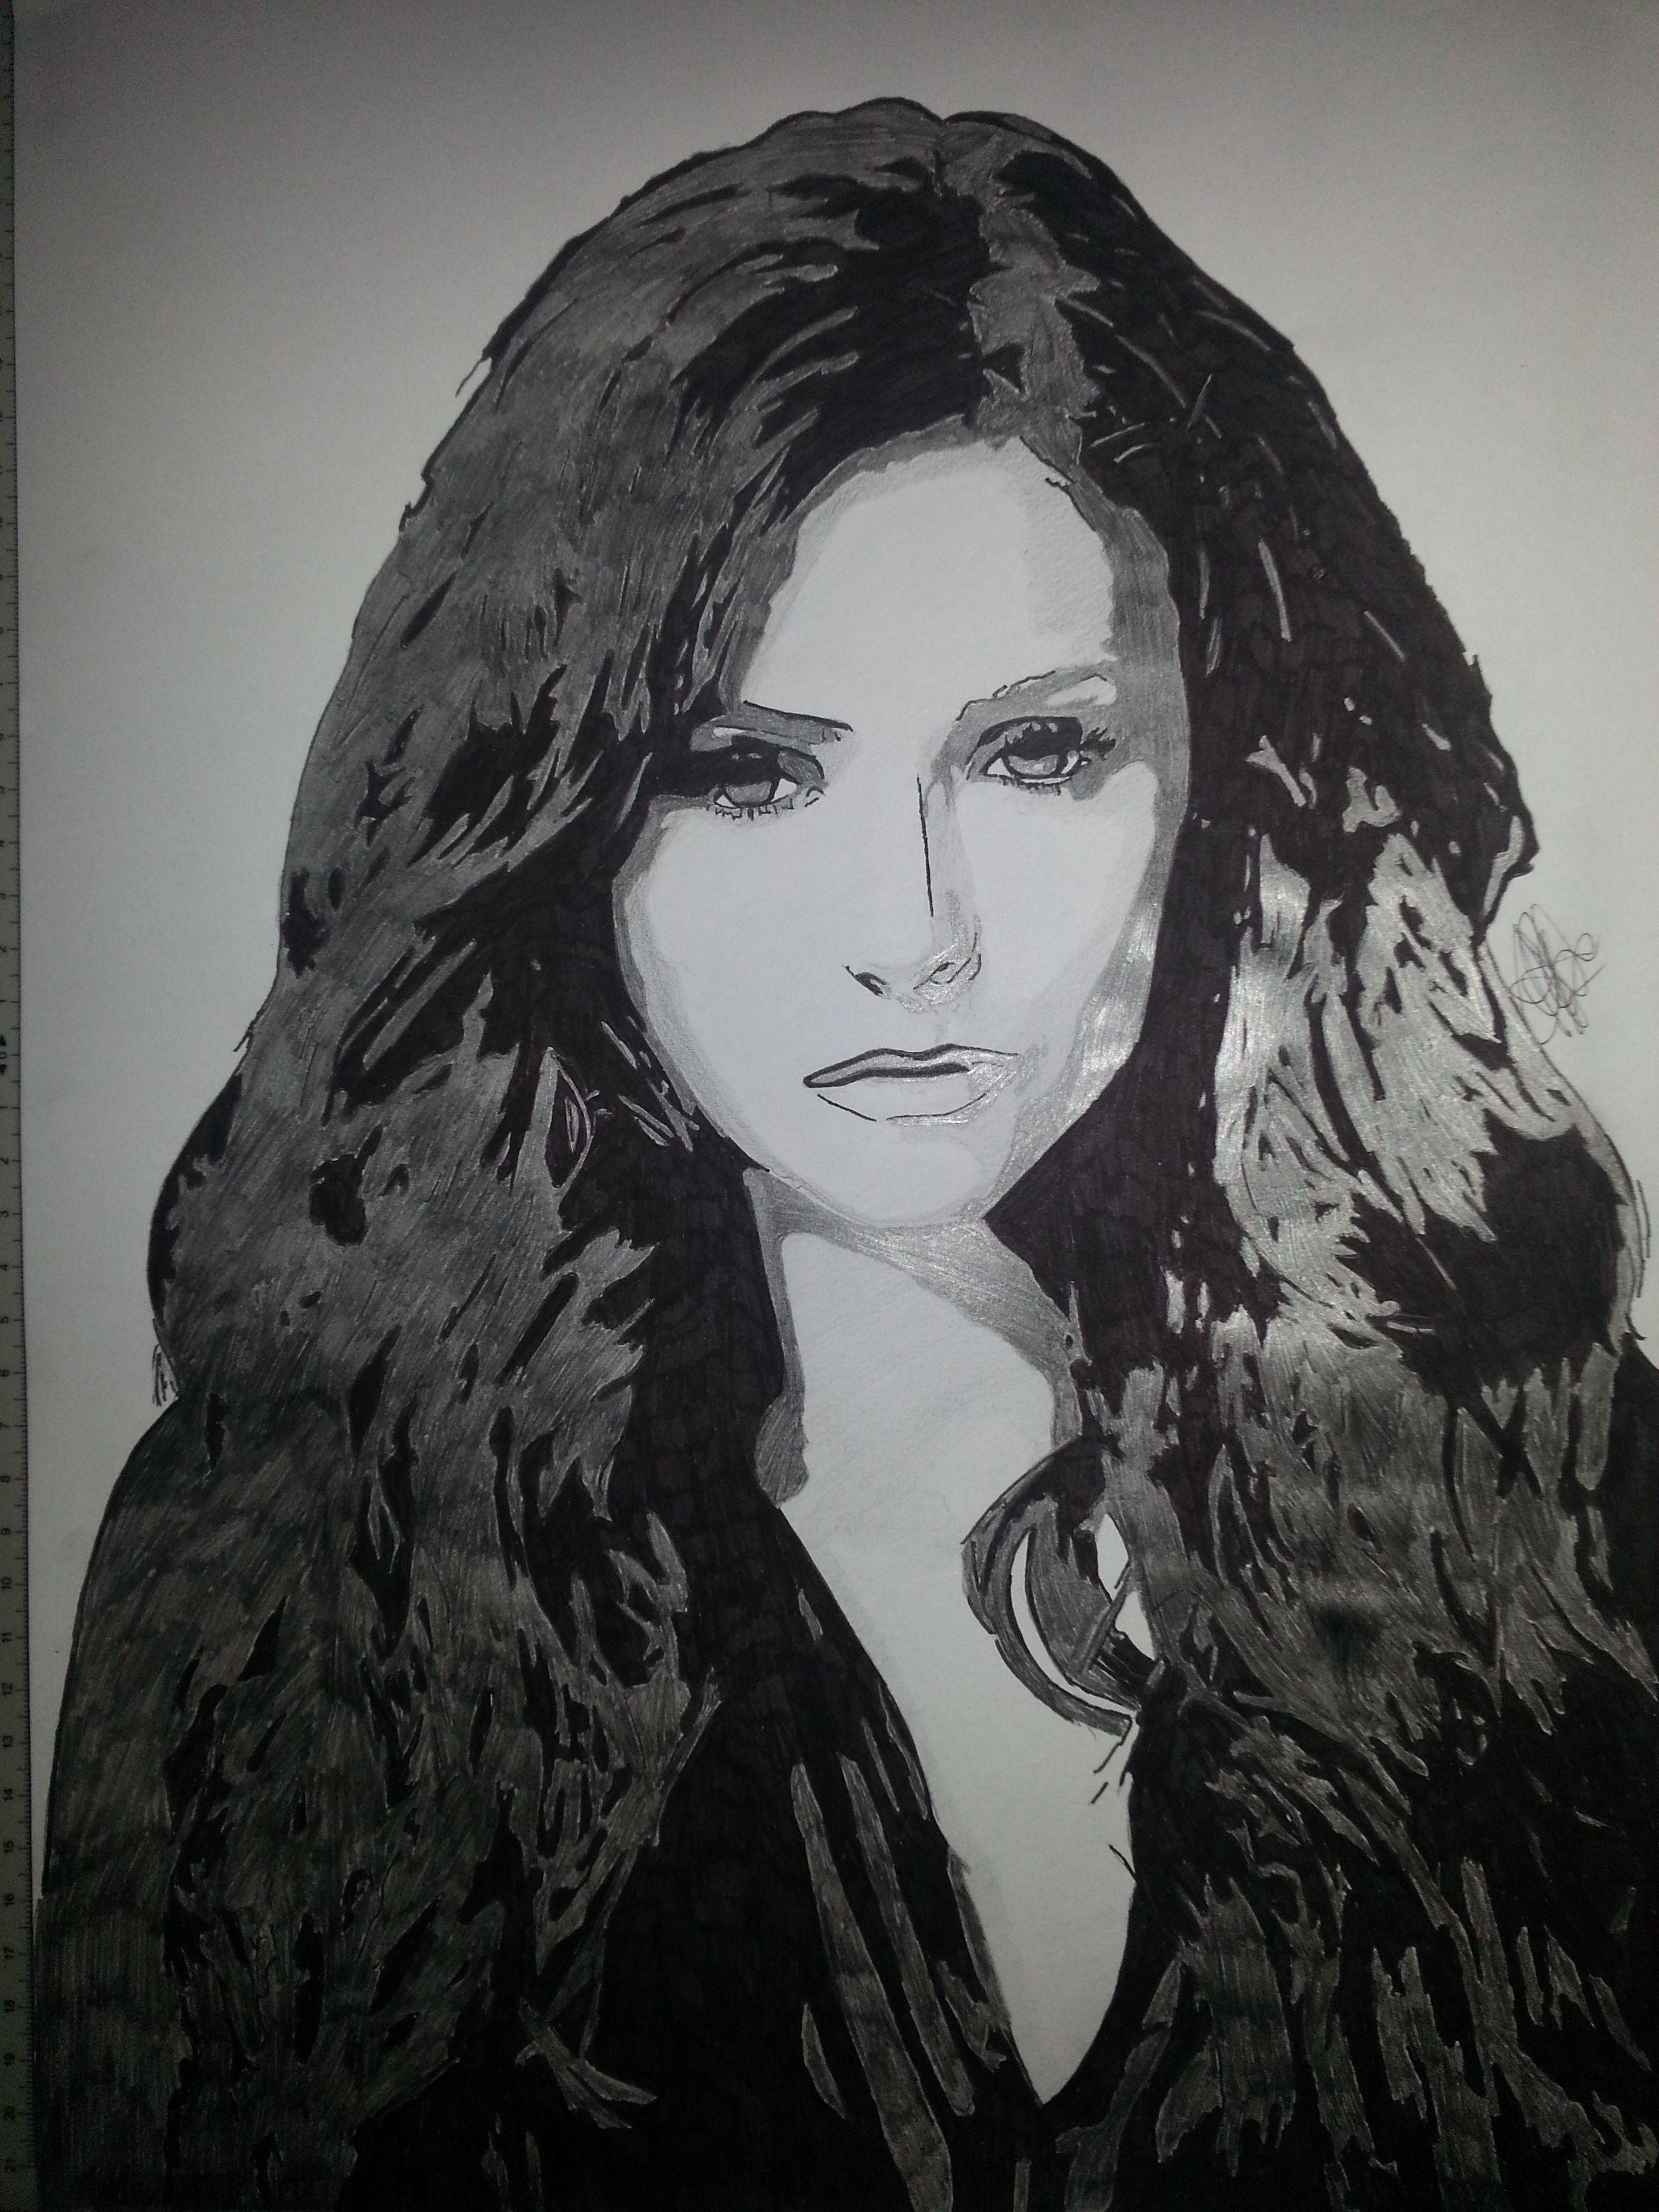 Nina dobrev alias katherina pierce and elena gilbert on vampire diaries emmris dessin dessin - Coloriage vampire diaries ...